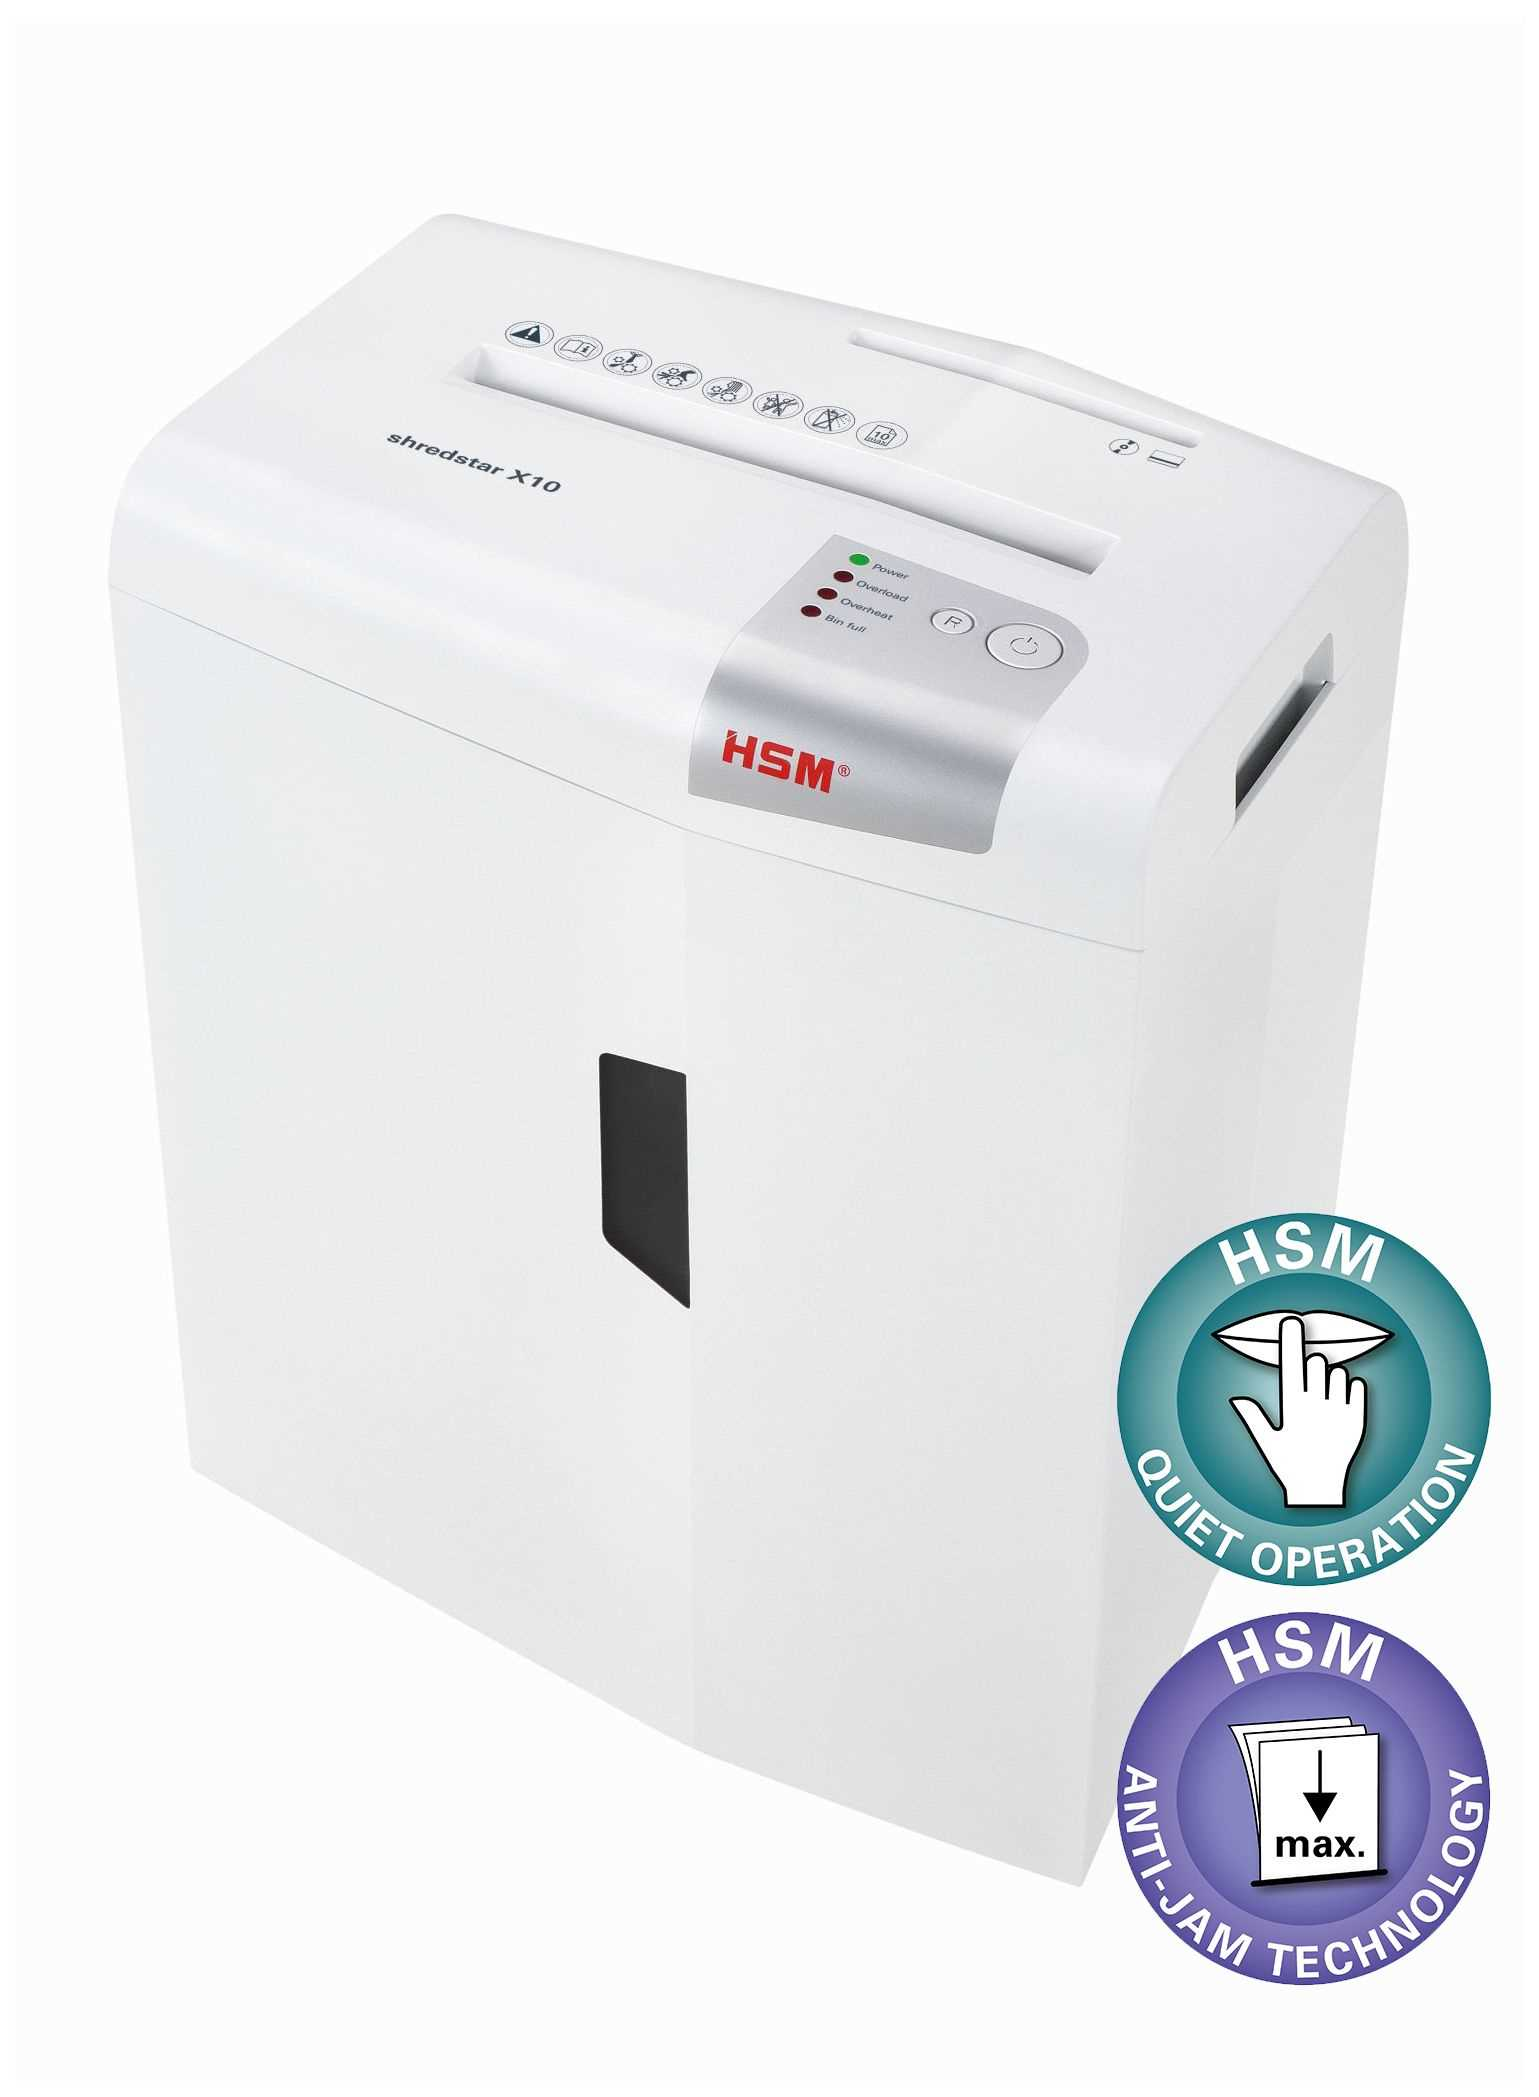 HSM skartovač ShredStar X10 White (velikost řezu 4,5x30mm, DIN 3)